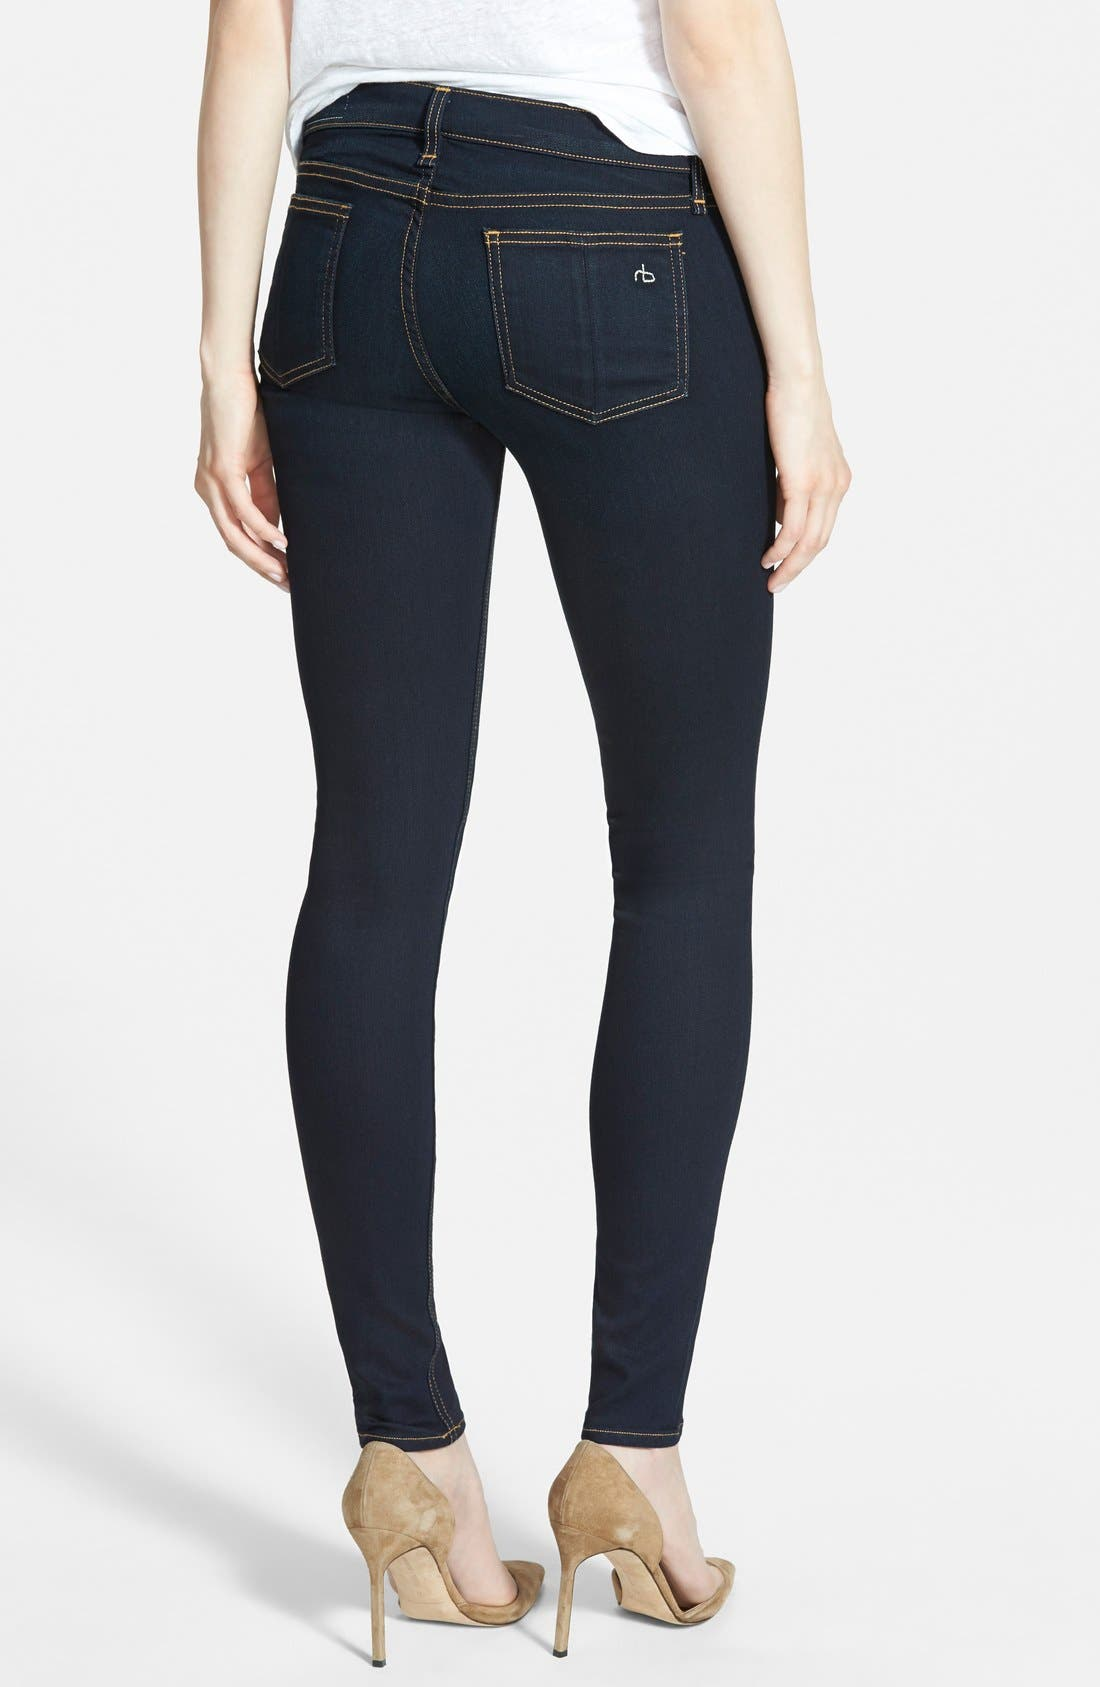 Alternate Image 2  - rag & bone/JEAN 'The Skinny' Mid Rise Jeans (Coventry)